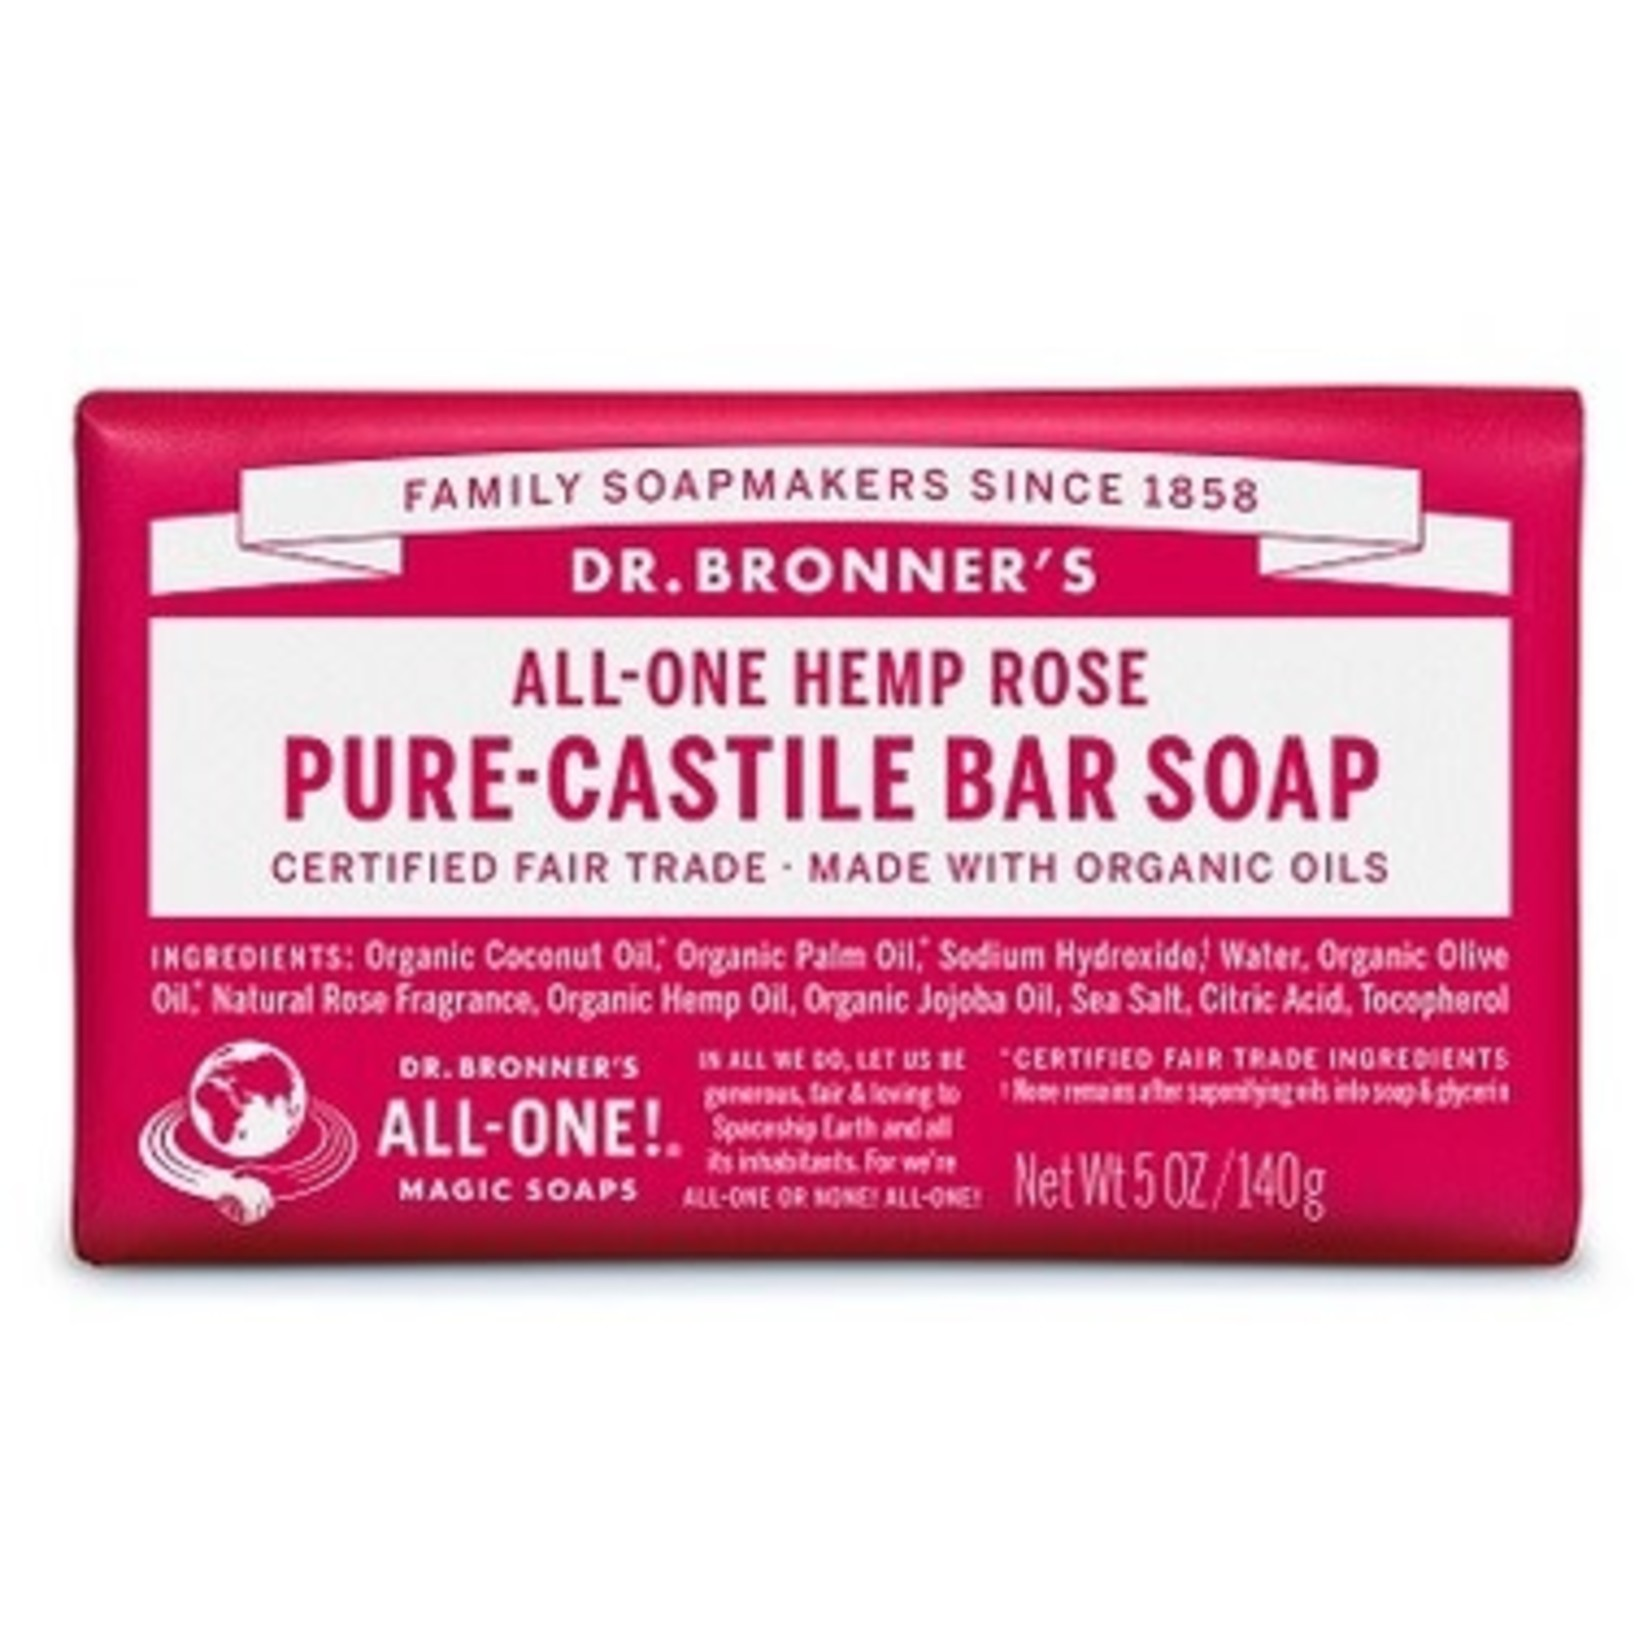 DR. BRONNER'S PURE CASTILE SOAP - ROSE